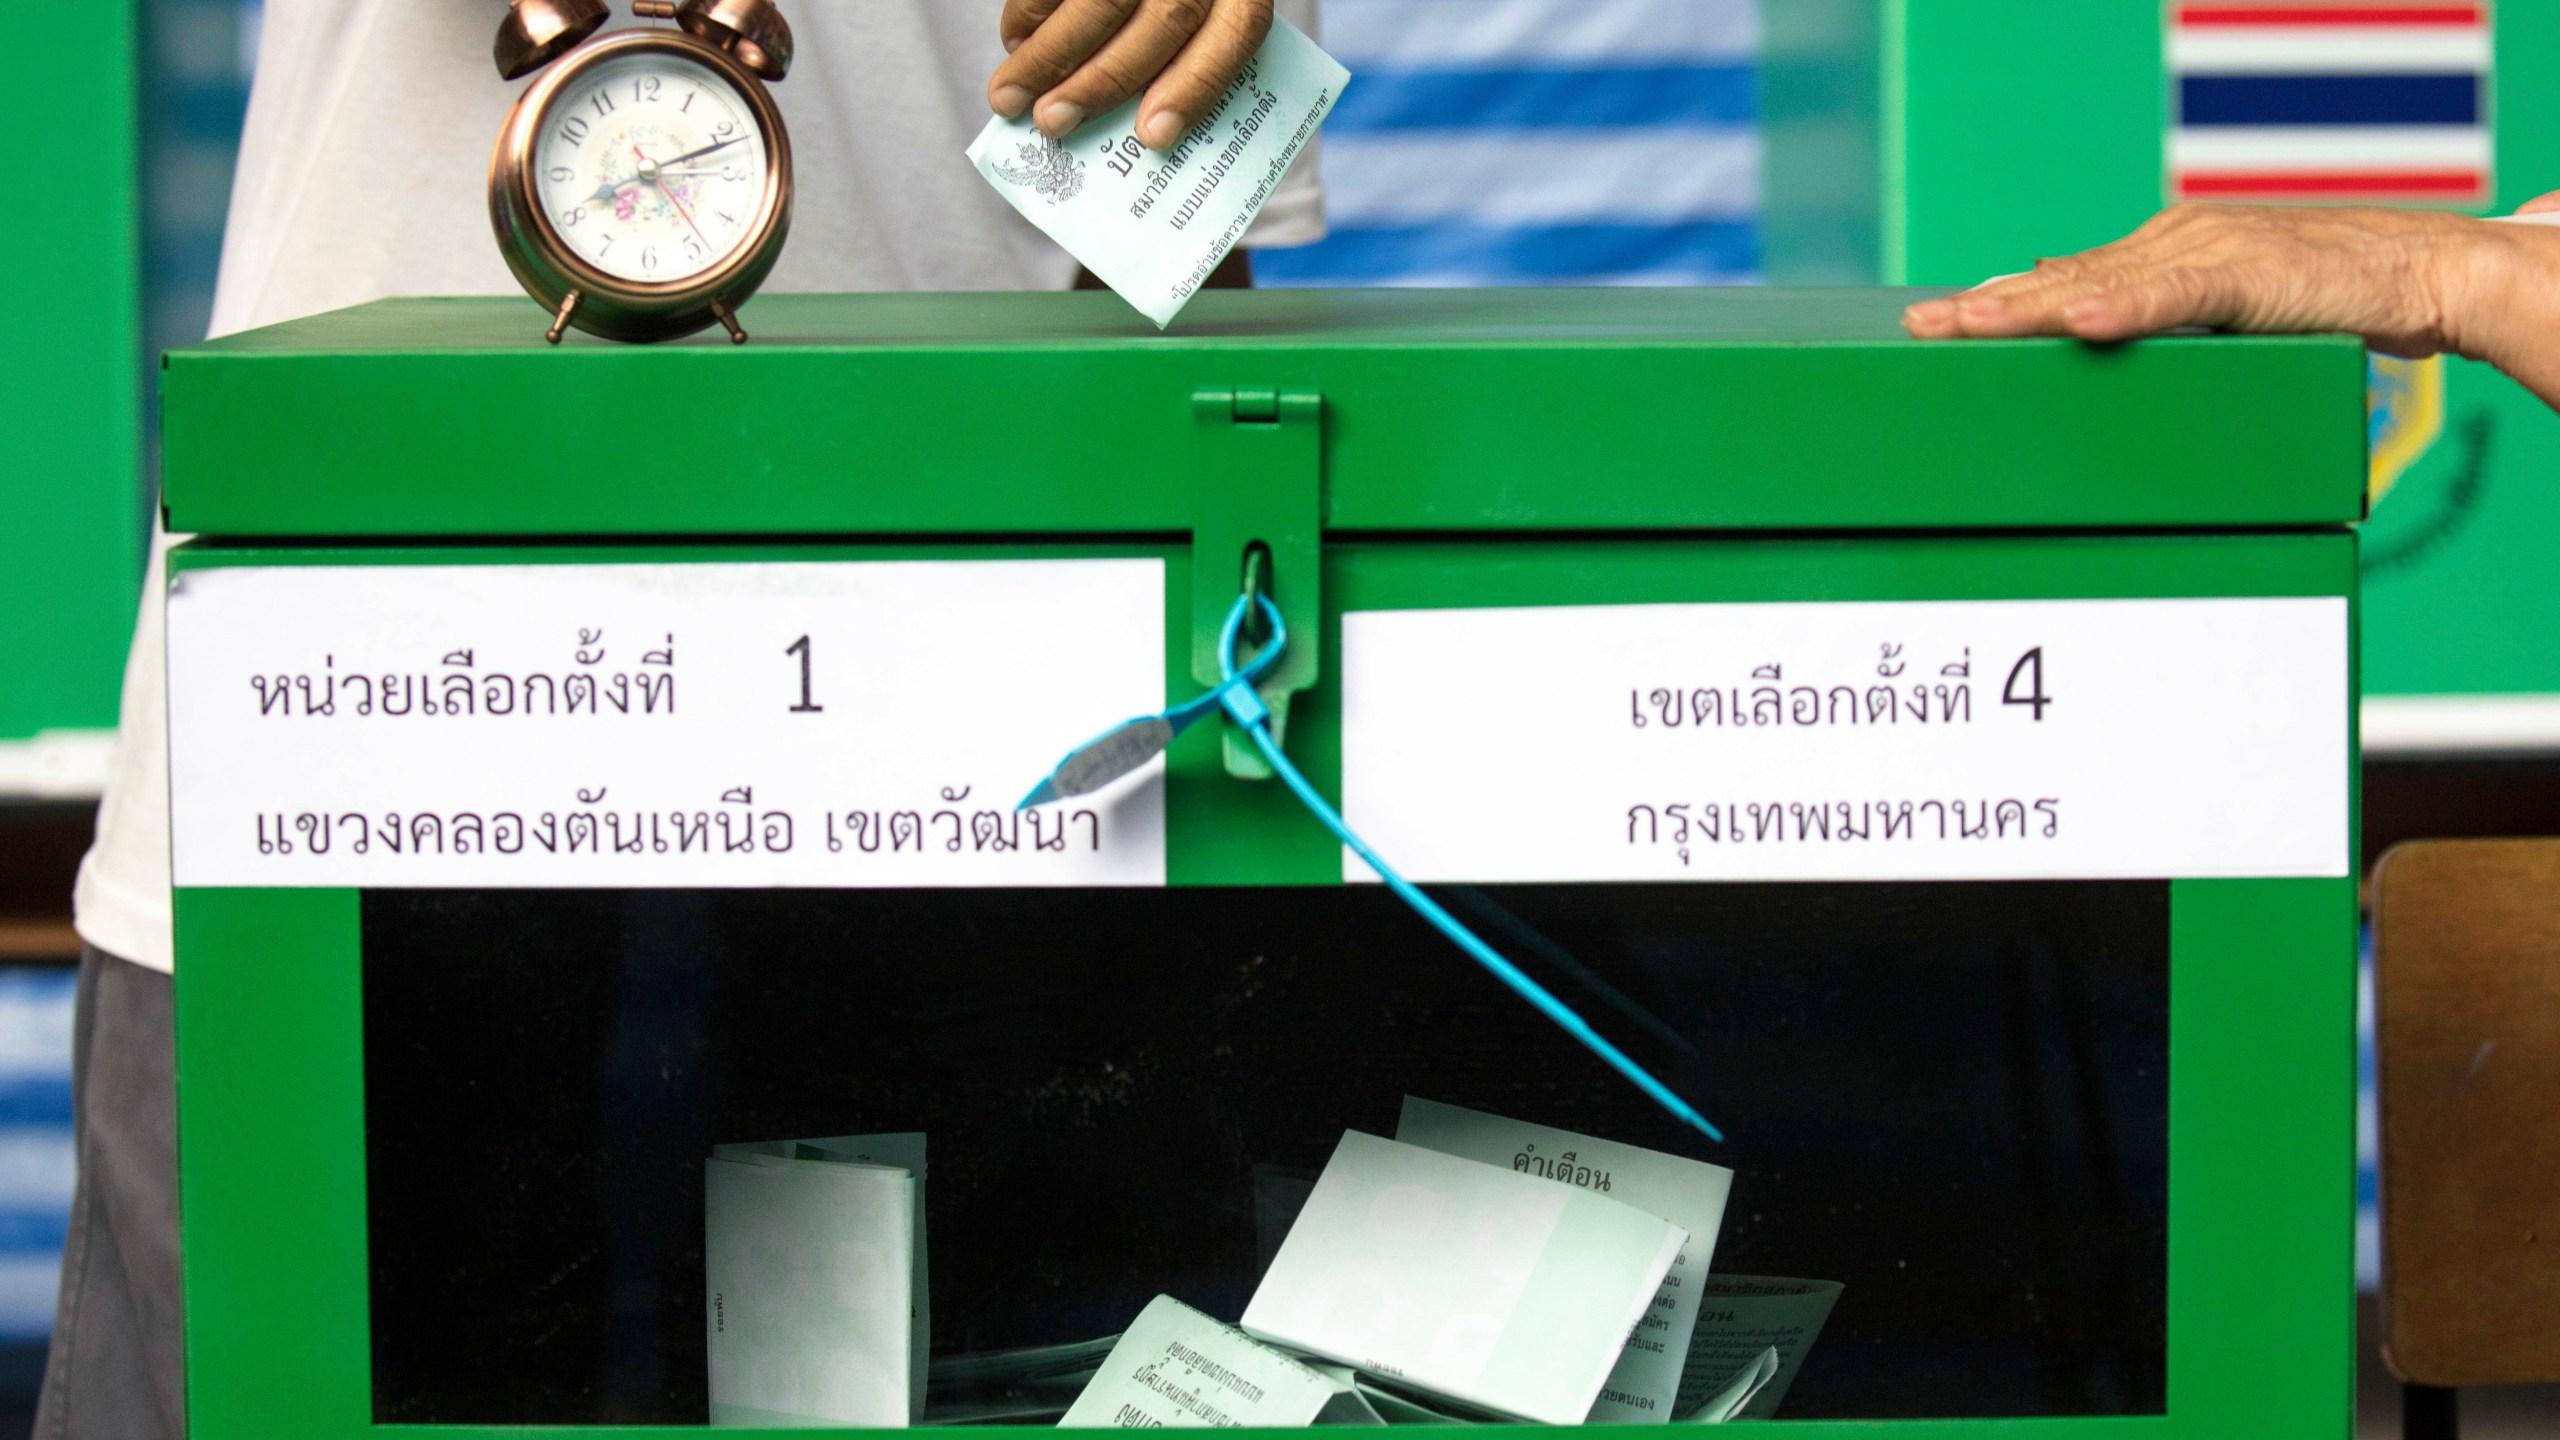 Thailand_Election_50816-159532.jpg48530477